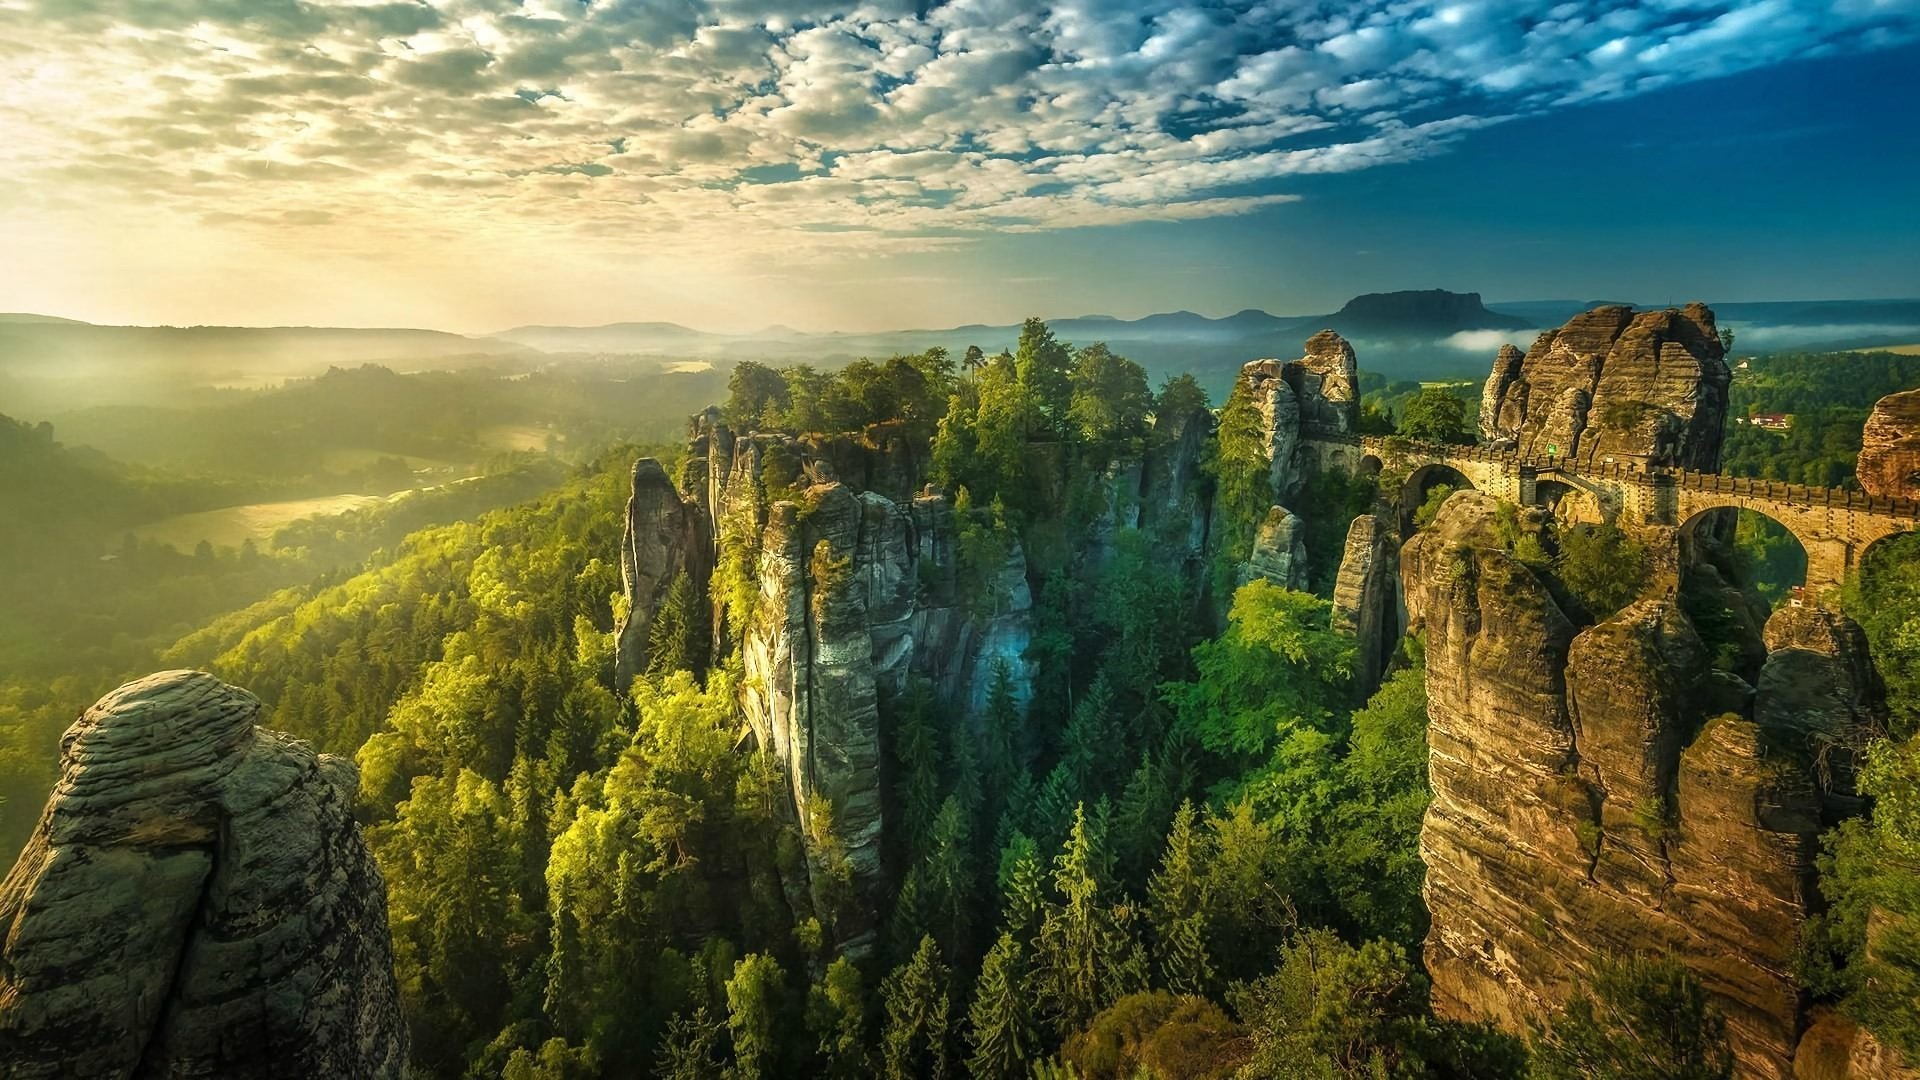 landscape wallpaper pack 1080p hd – landscape category